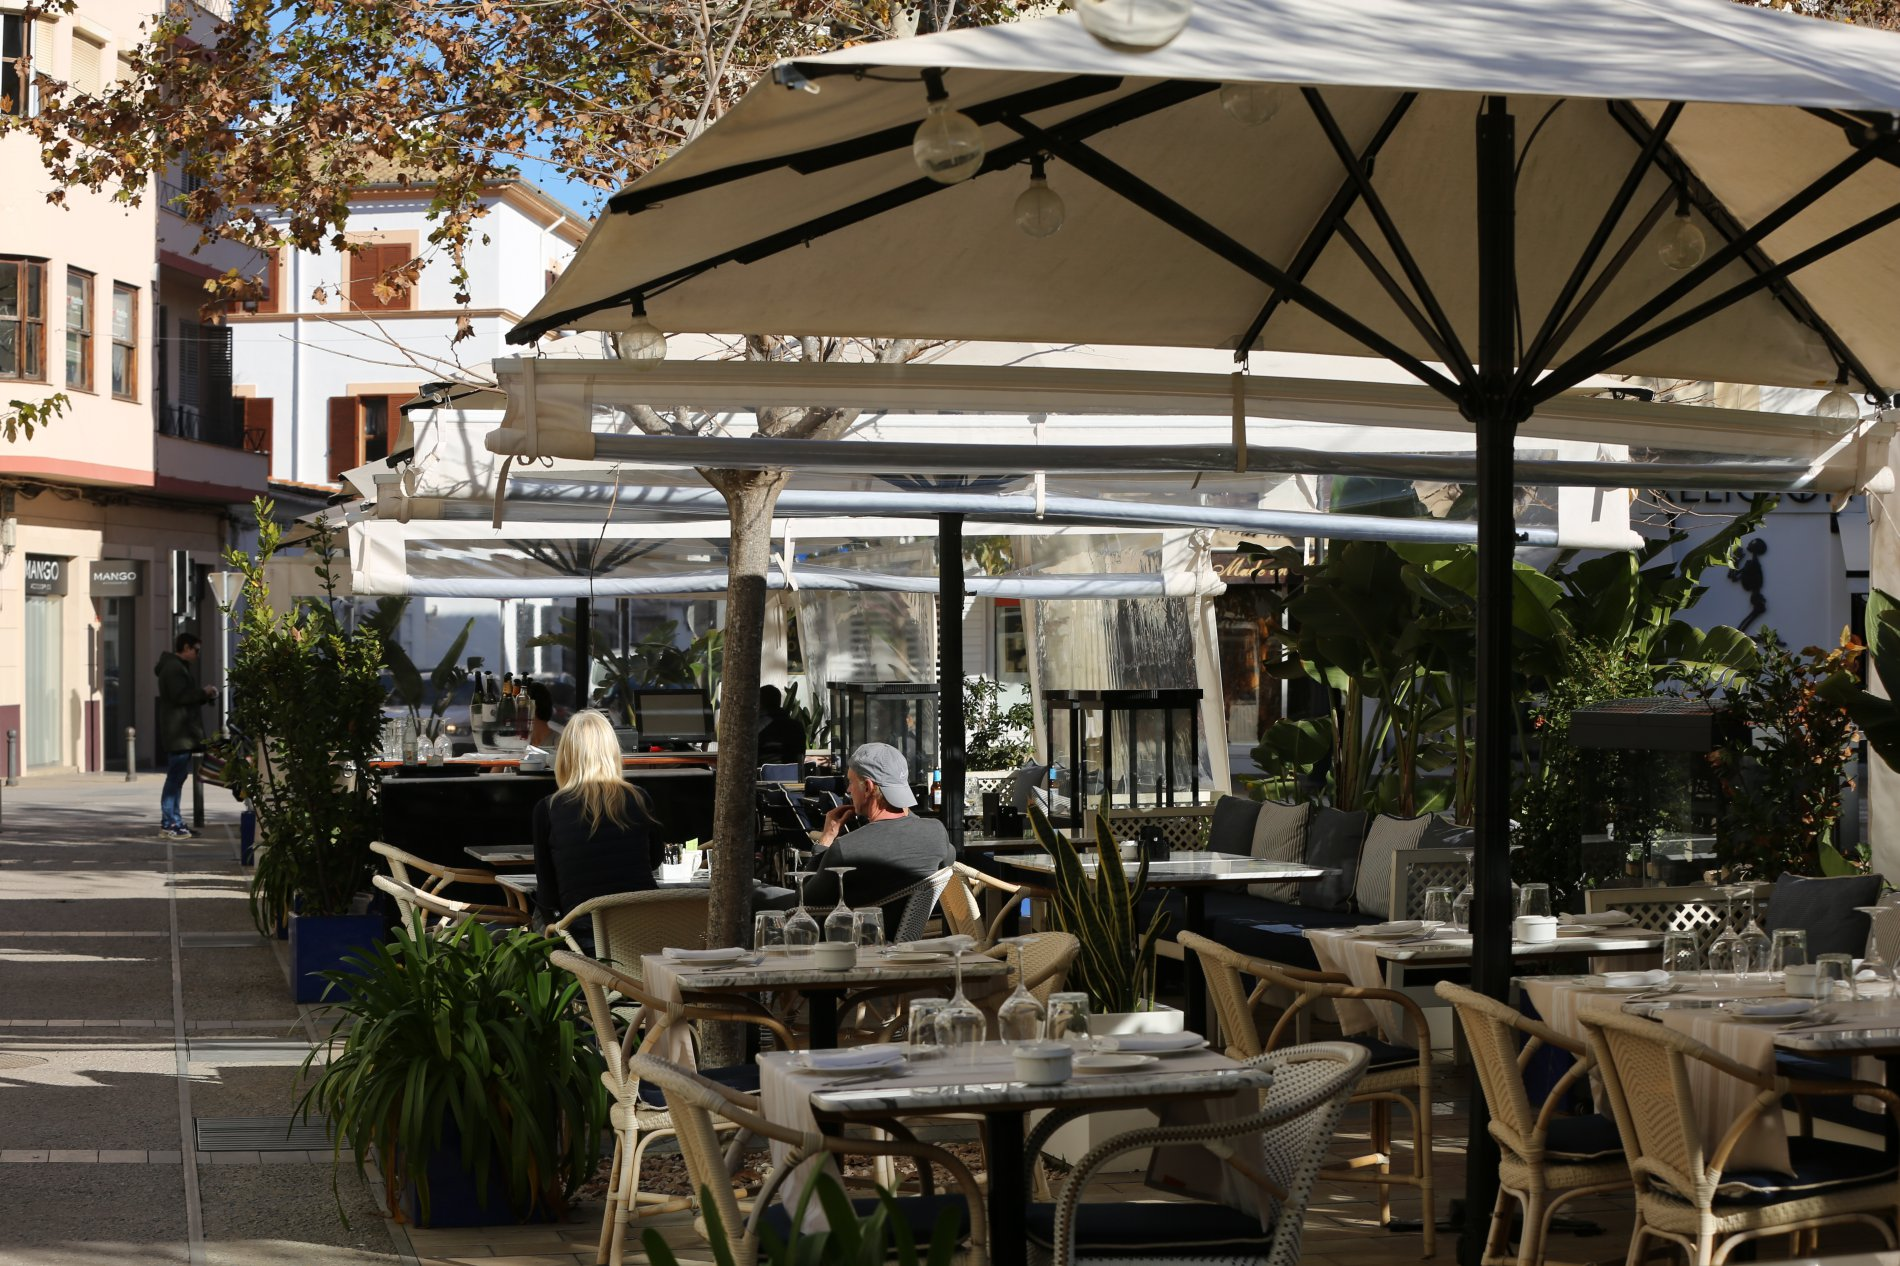 Ibiza en otoño e invierno: terraza del hotel 'Montesol by Hilton'